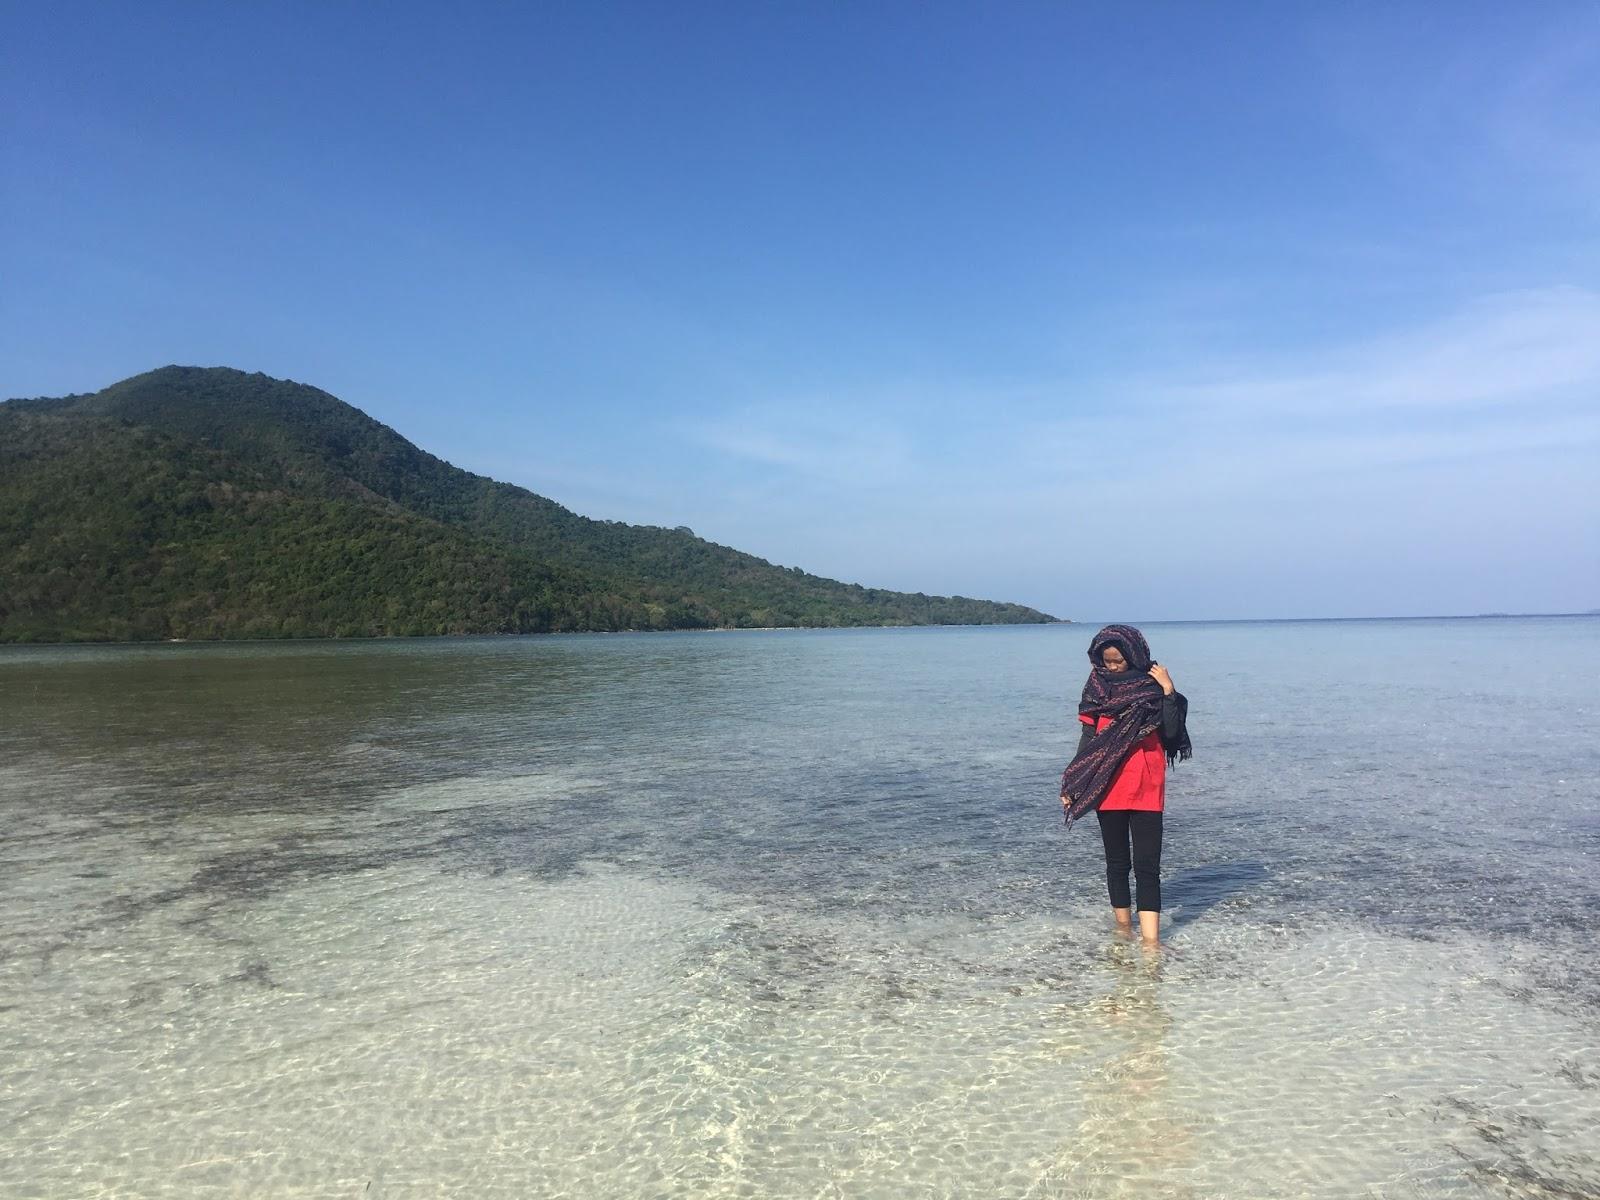 Wisata Ke Pantai Tipae